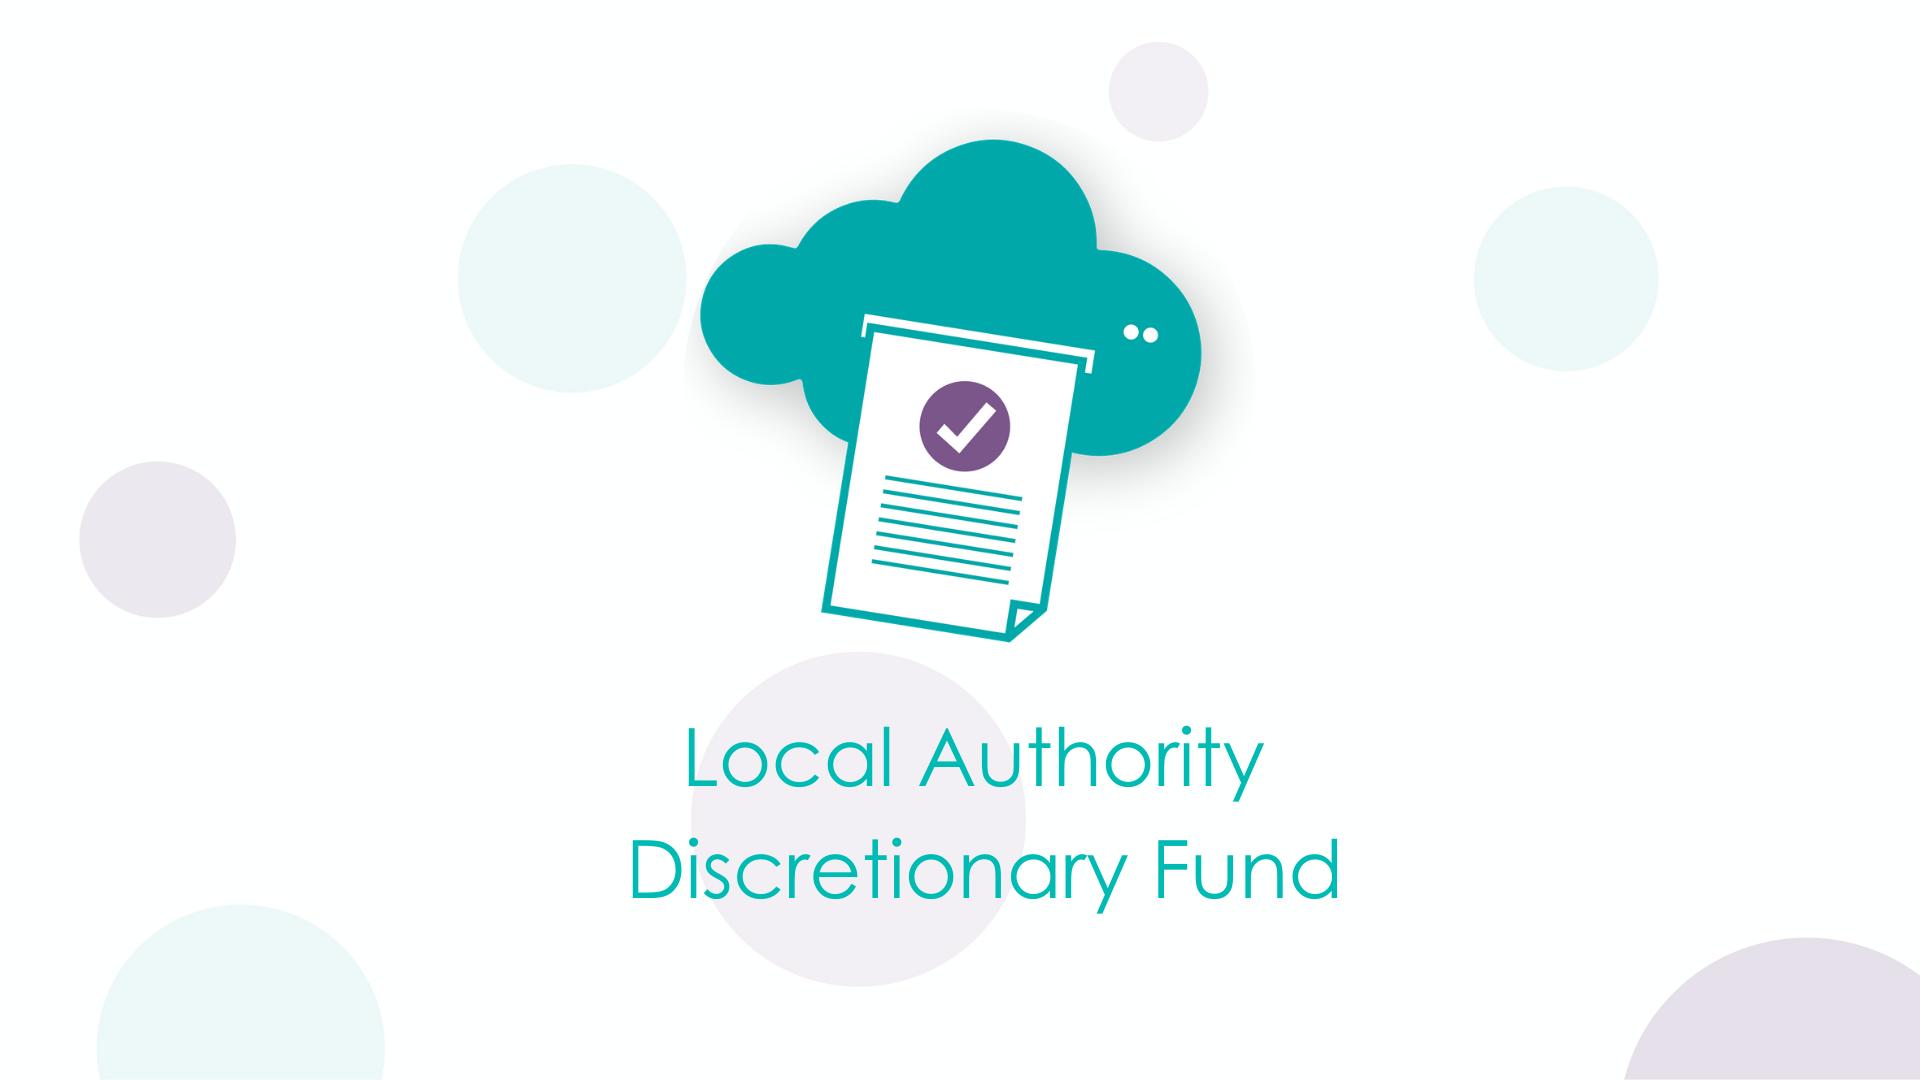 Local Authority Discretionary Fund